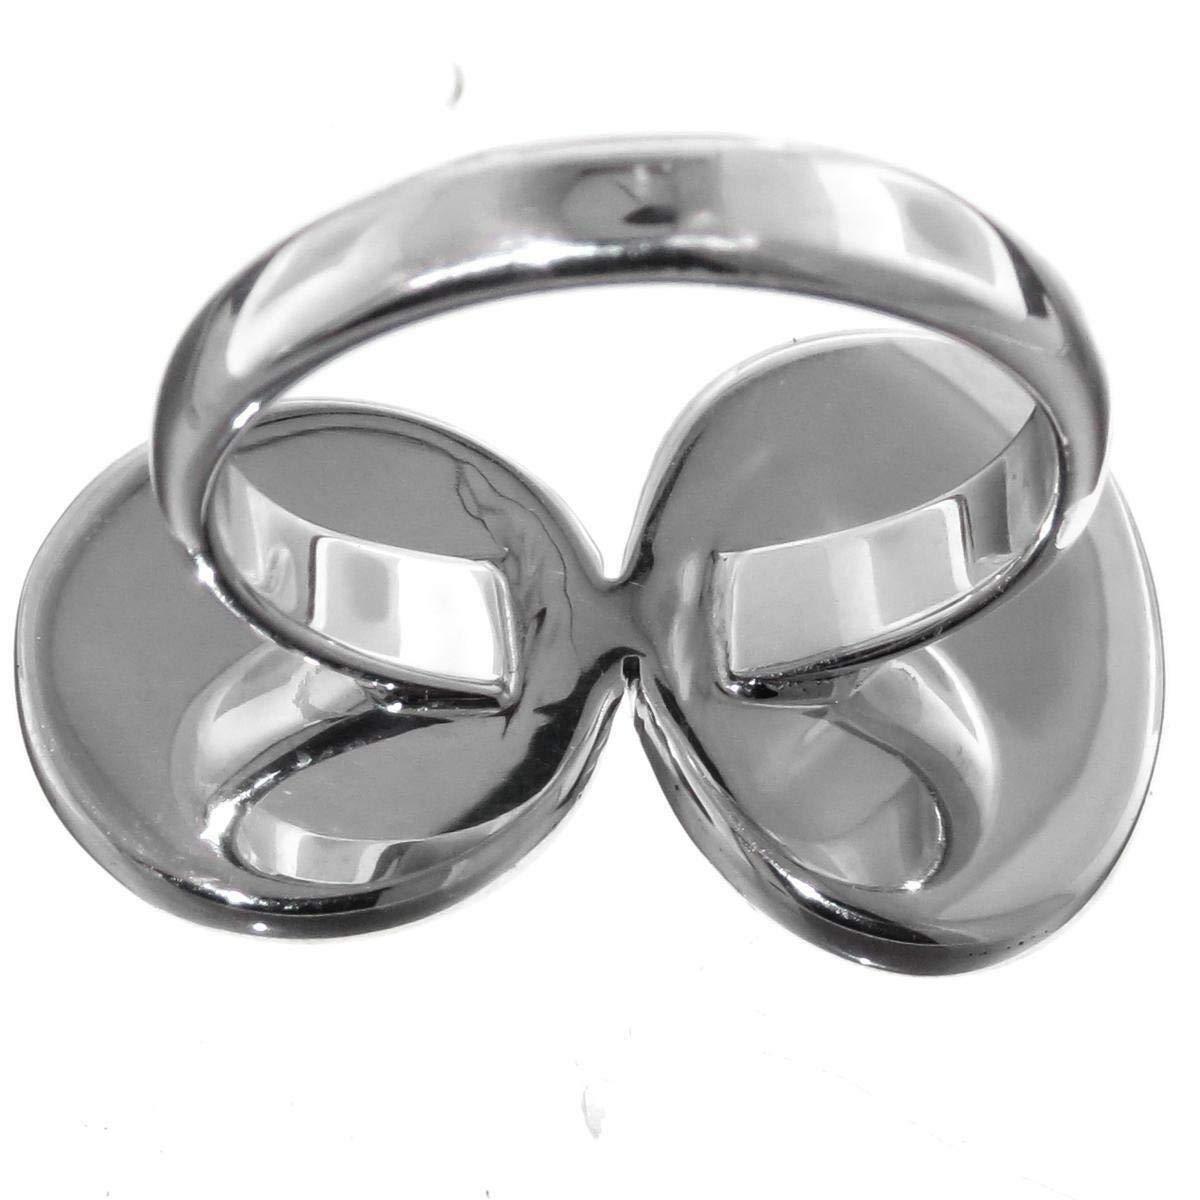 White Pearl Opal Titanium DRUZY Drusy SZ 9 925 Sterling Silver Ring YE-2387